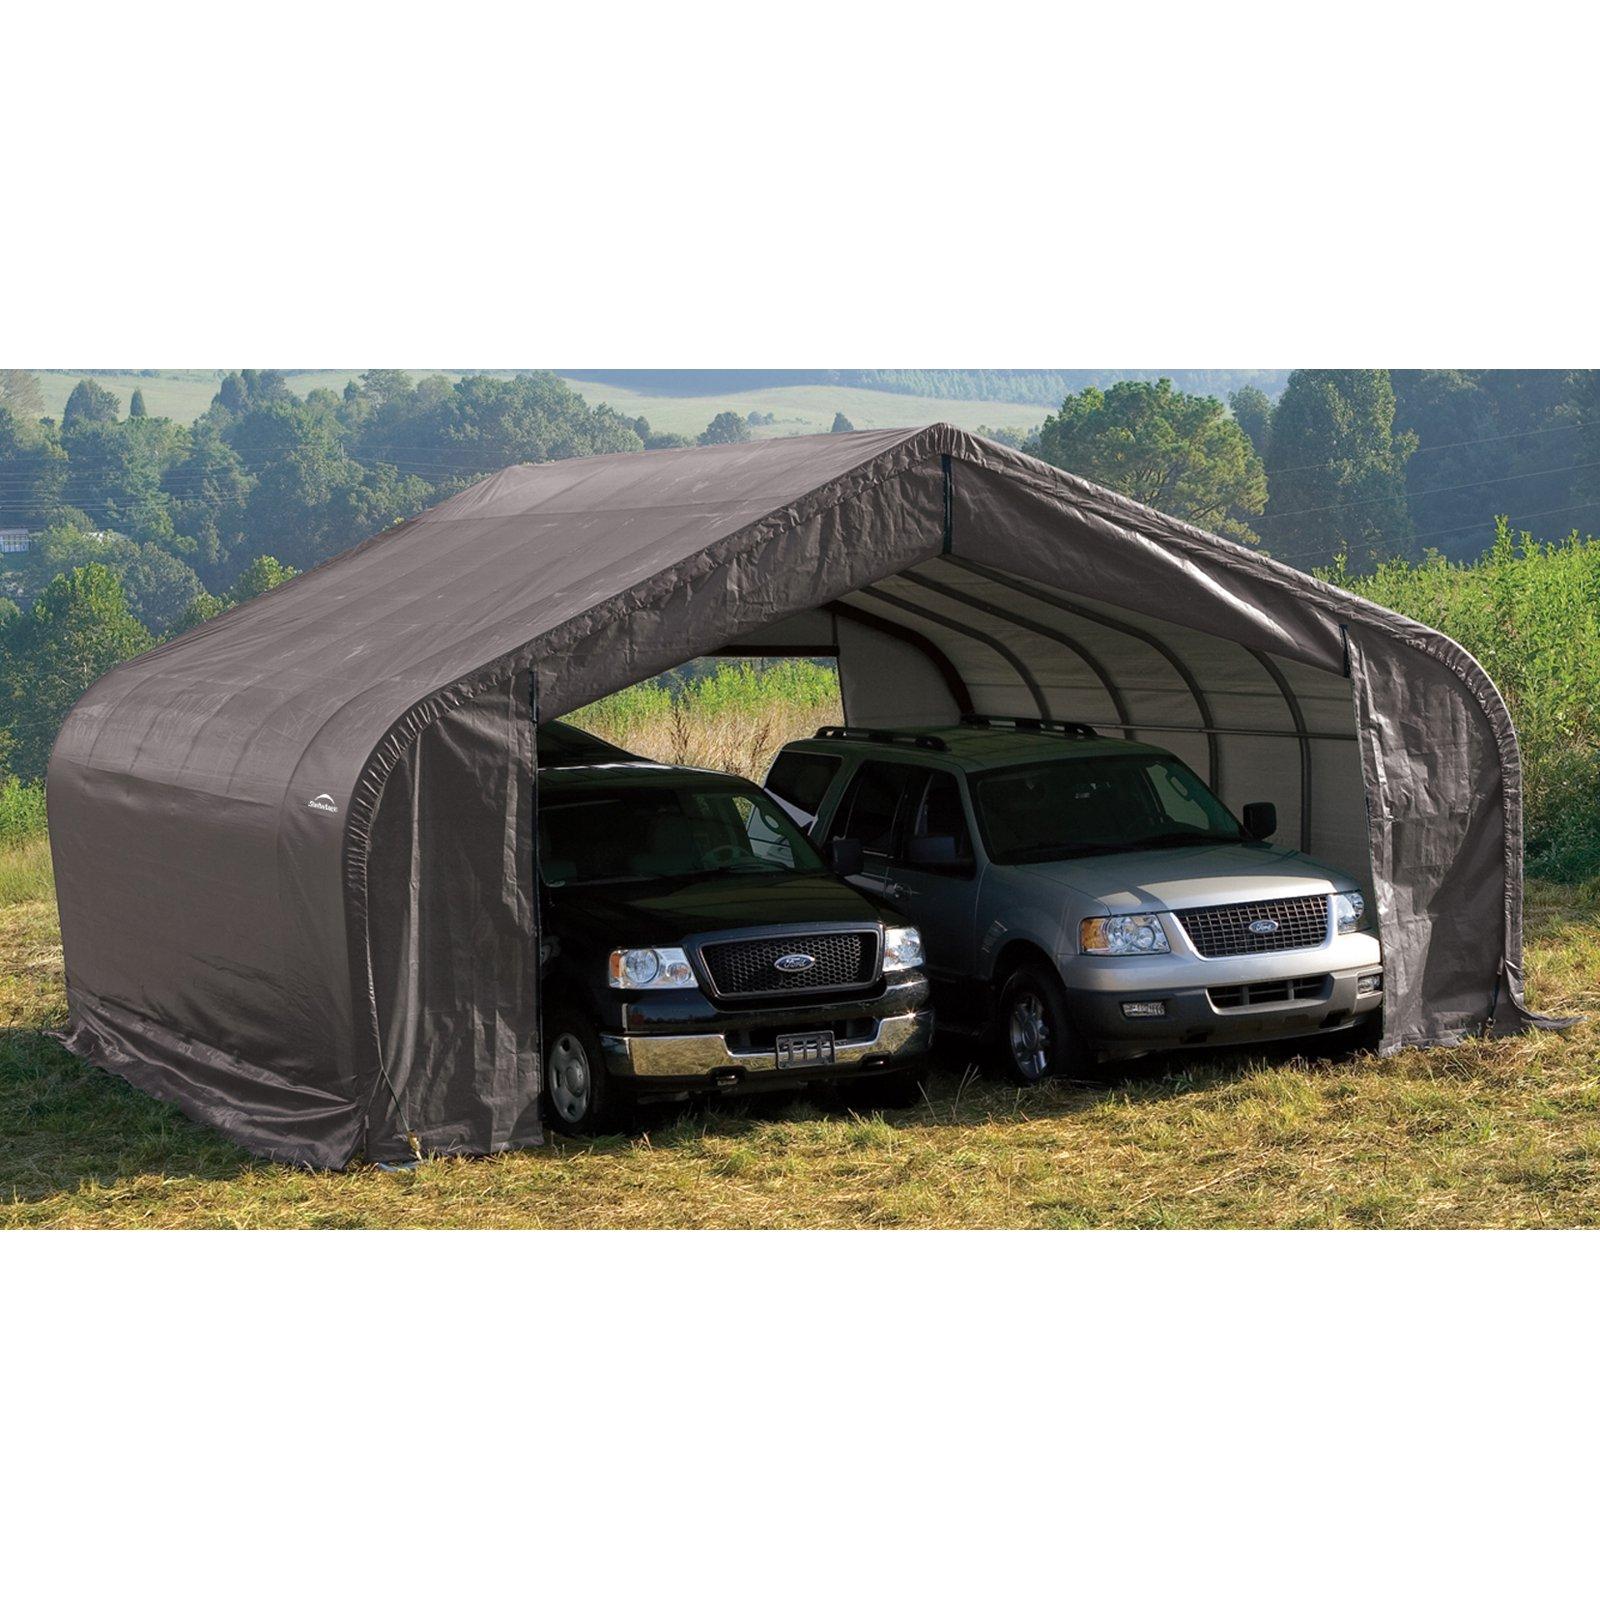 22' x 28' x 10' Peak Style Shelter, Green